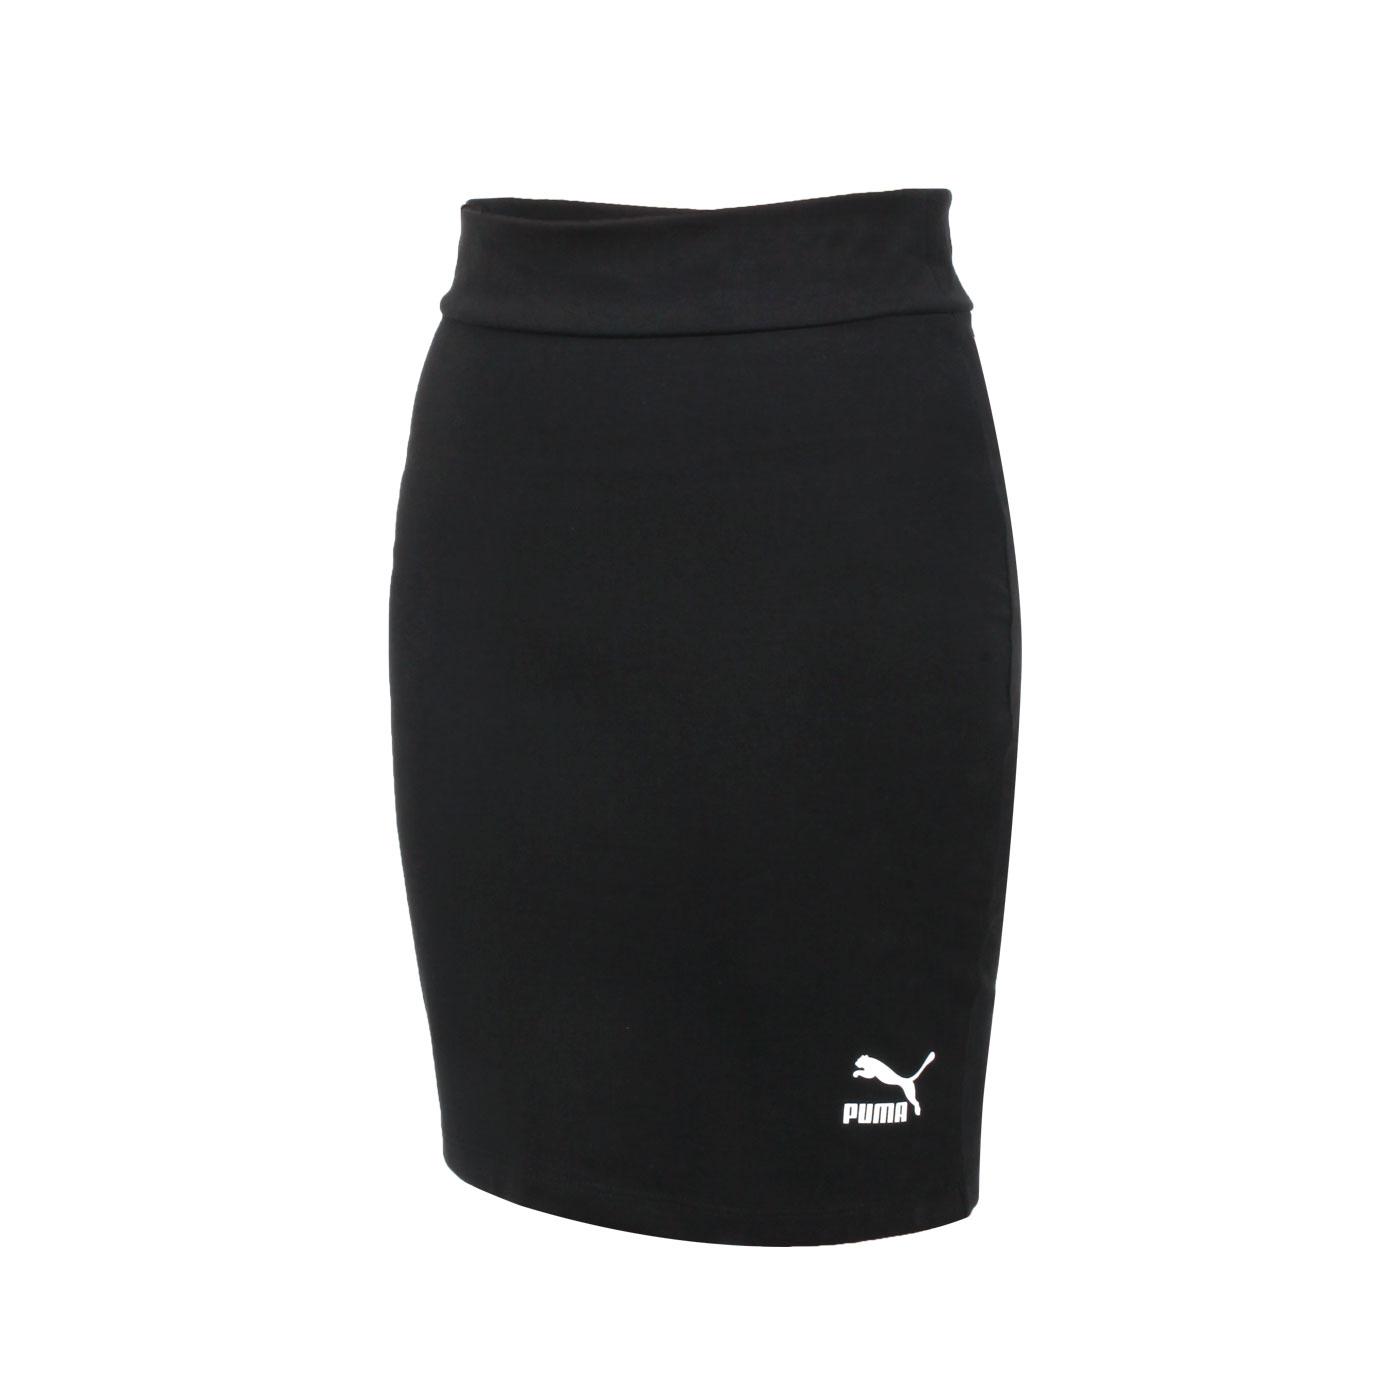 PUMA 女款Classics短裙 59959601 - 黑白